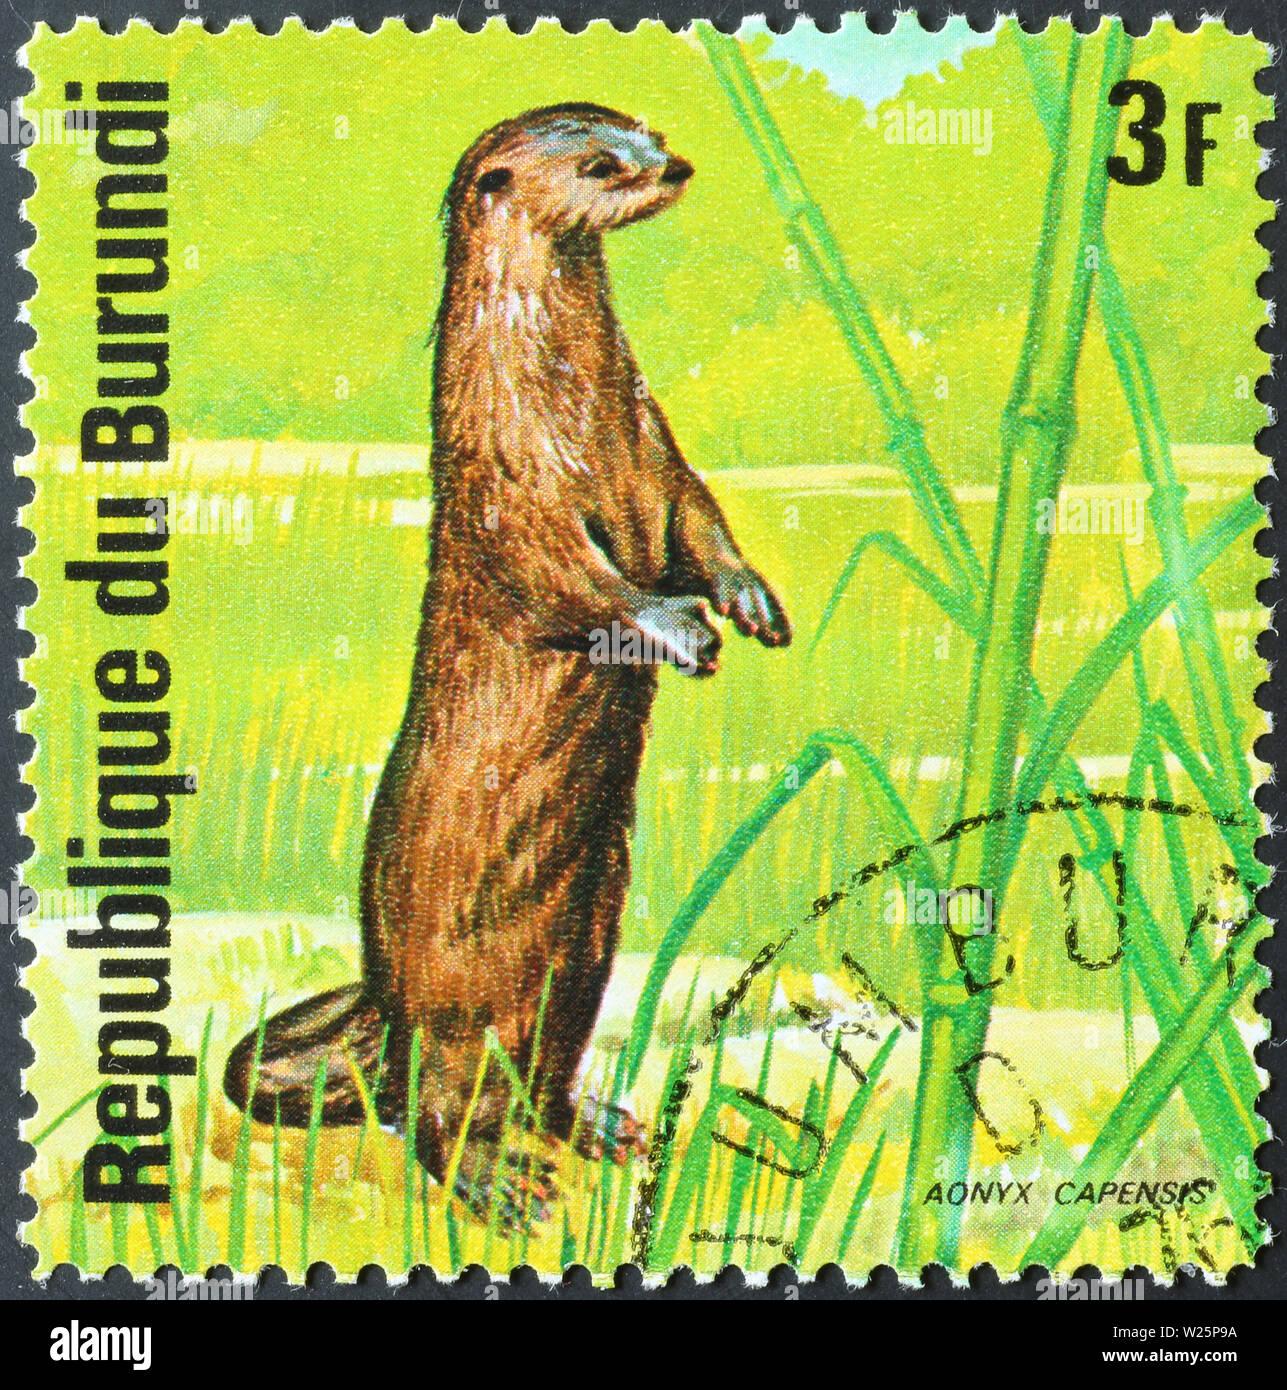 Otter on postage stamp of Burundi - Stock Image